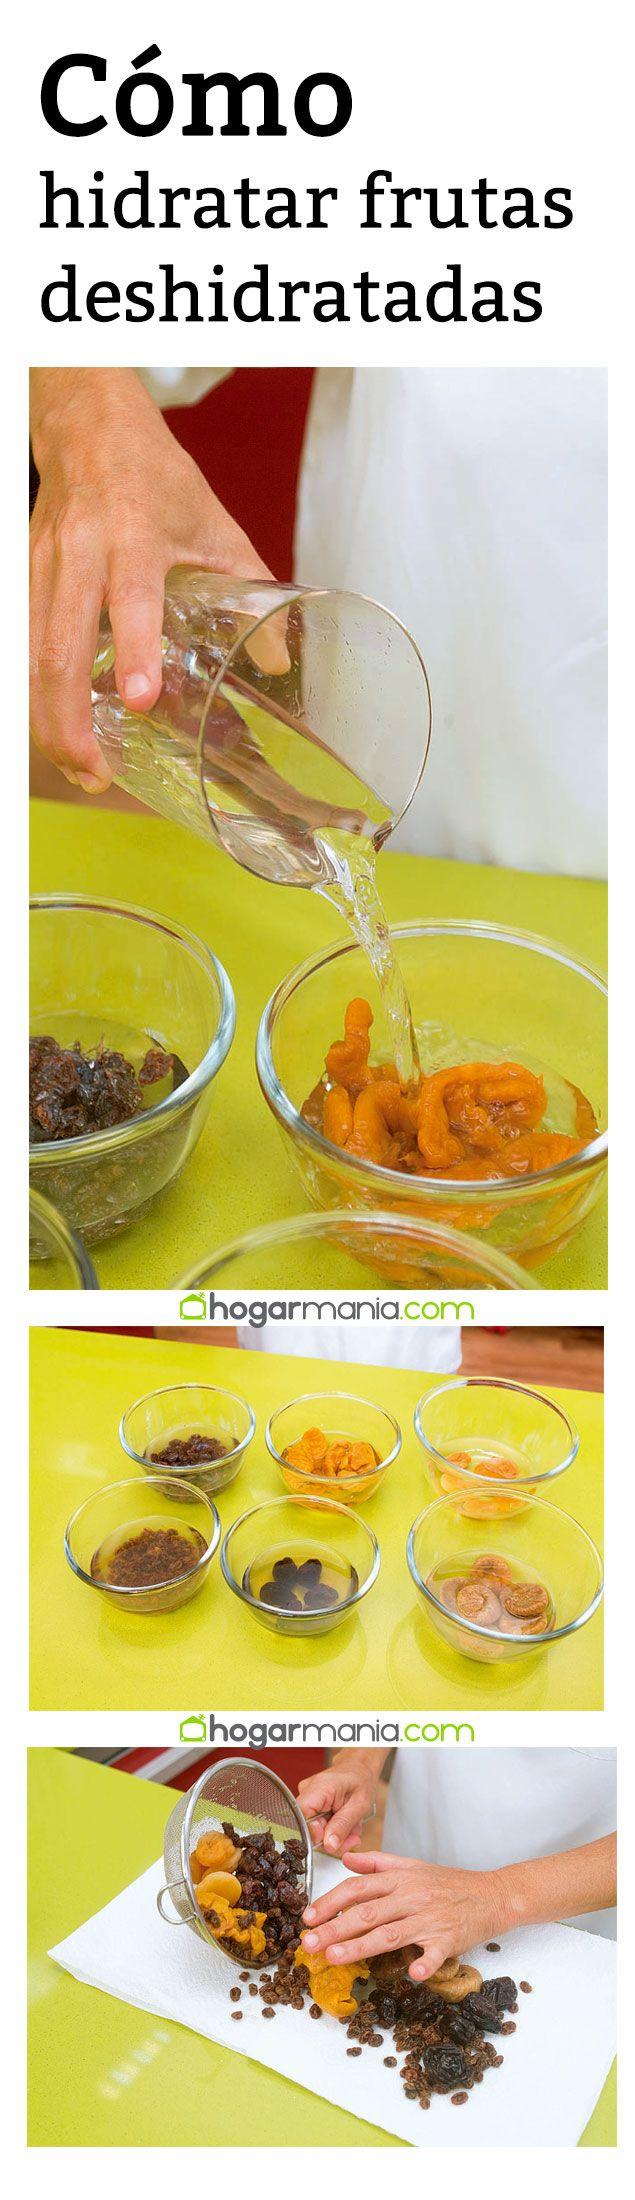 Cómo hidratar frutas deshidratadas. #hogarmania #eva #arguiñano #frutas #deshidratadas #tecnica #cocina